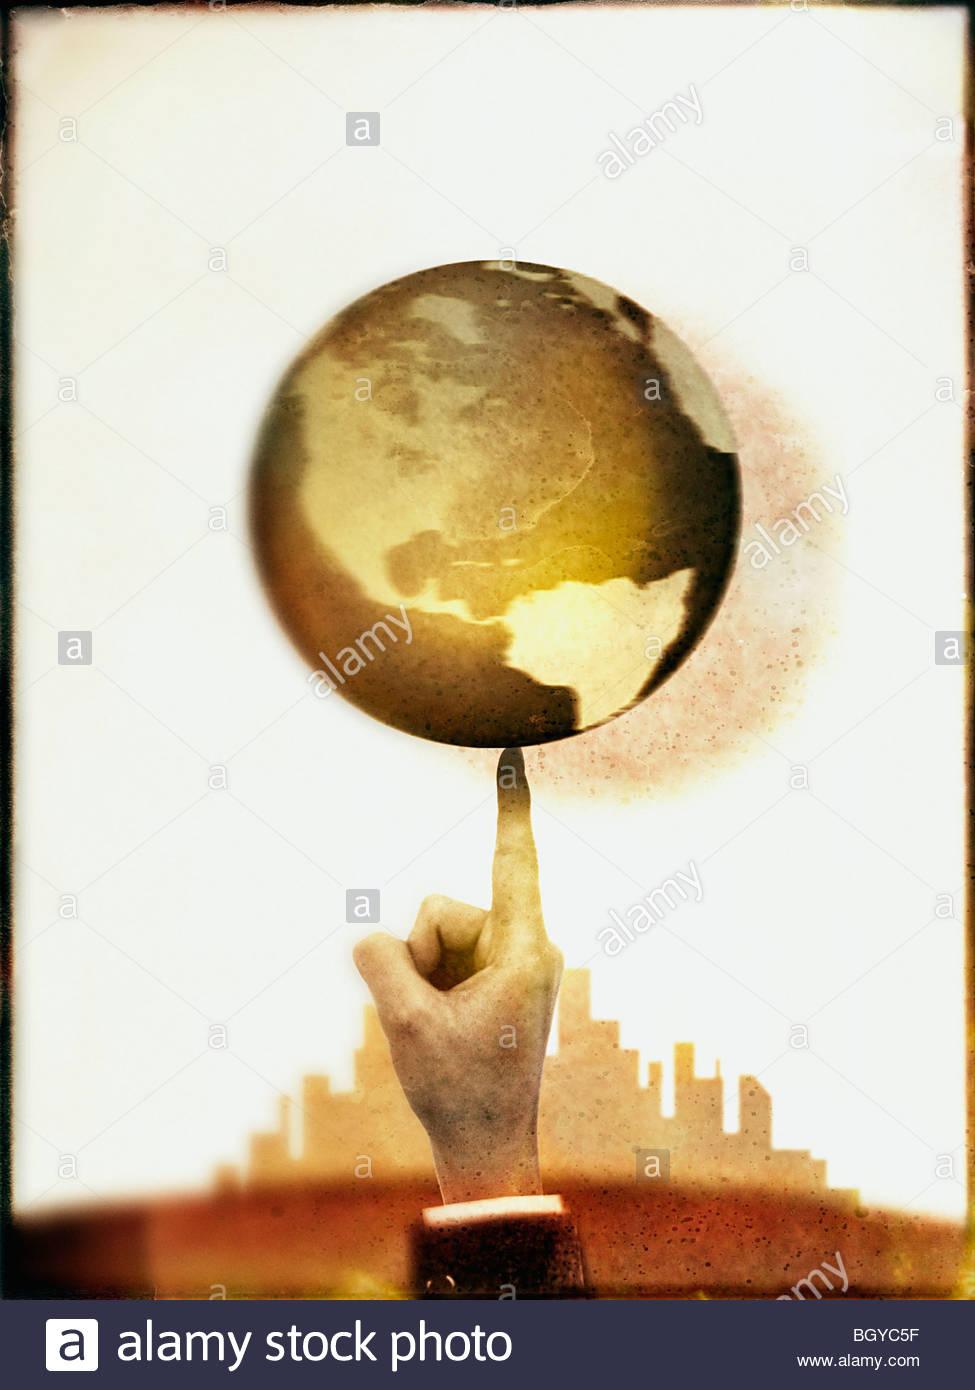 Businessman spinning globe - Stock Image